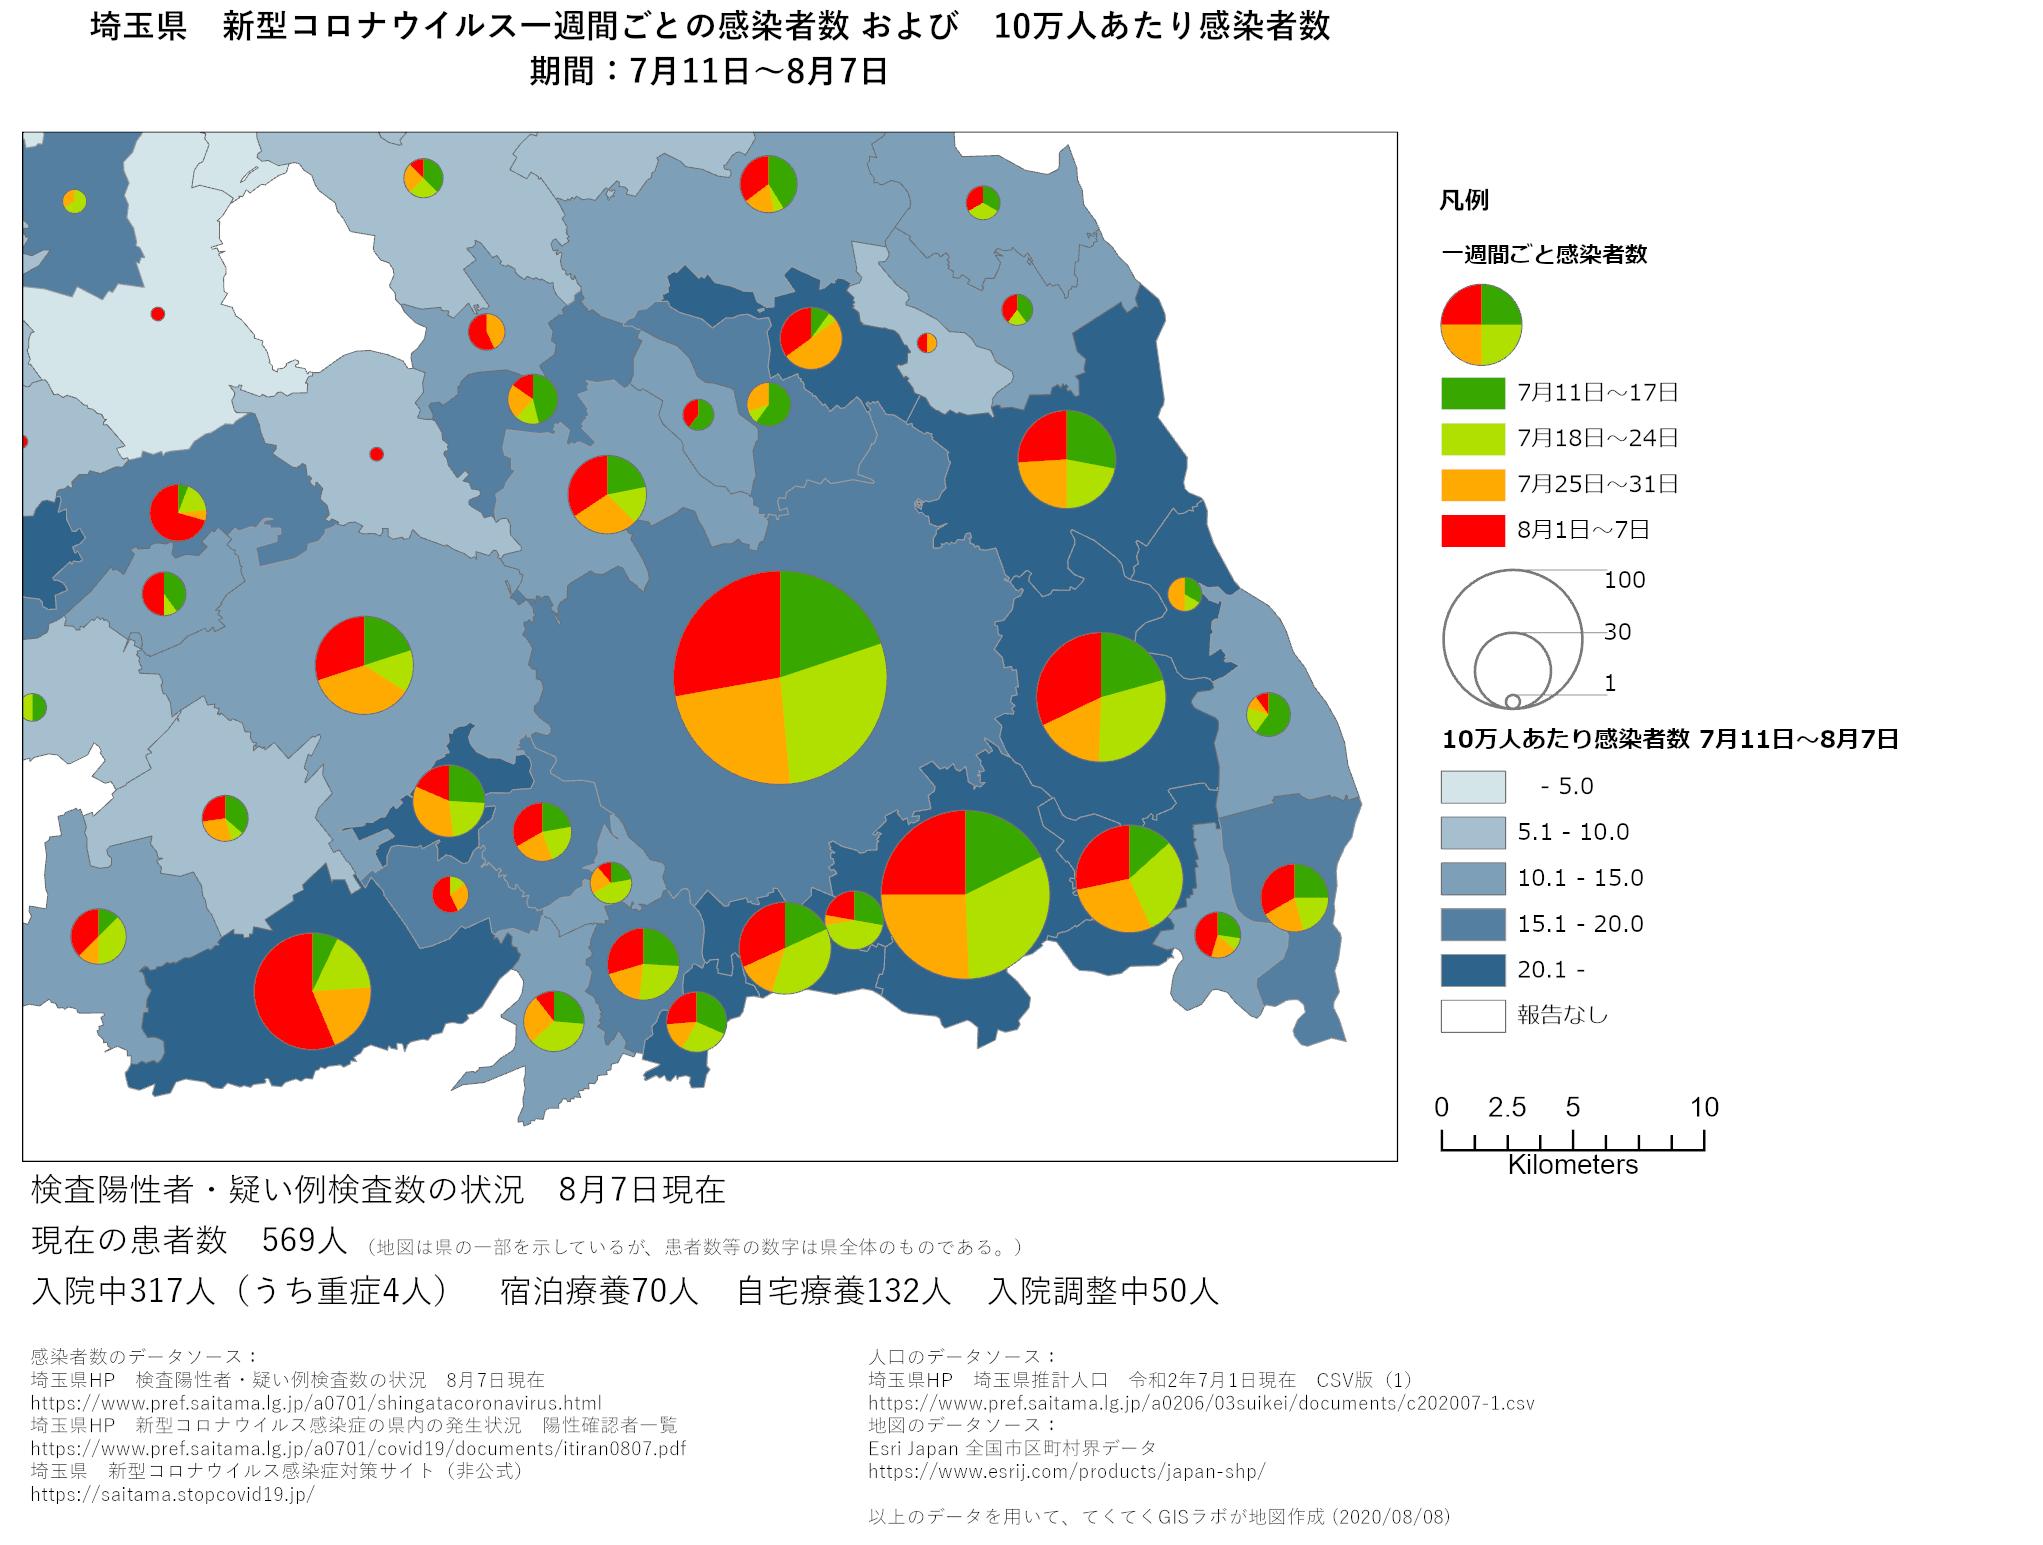 1週間ごと感染者数、埼玉県、7月11日〜8月7日